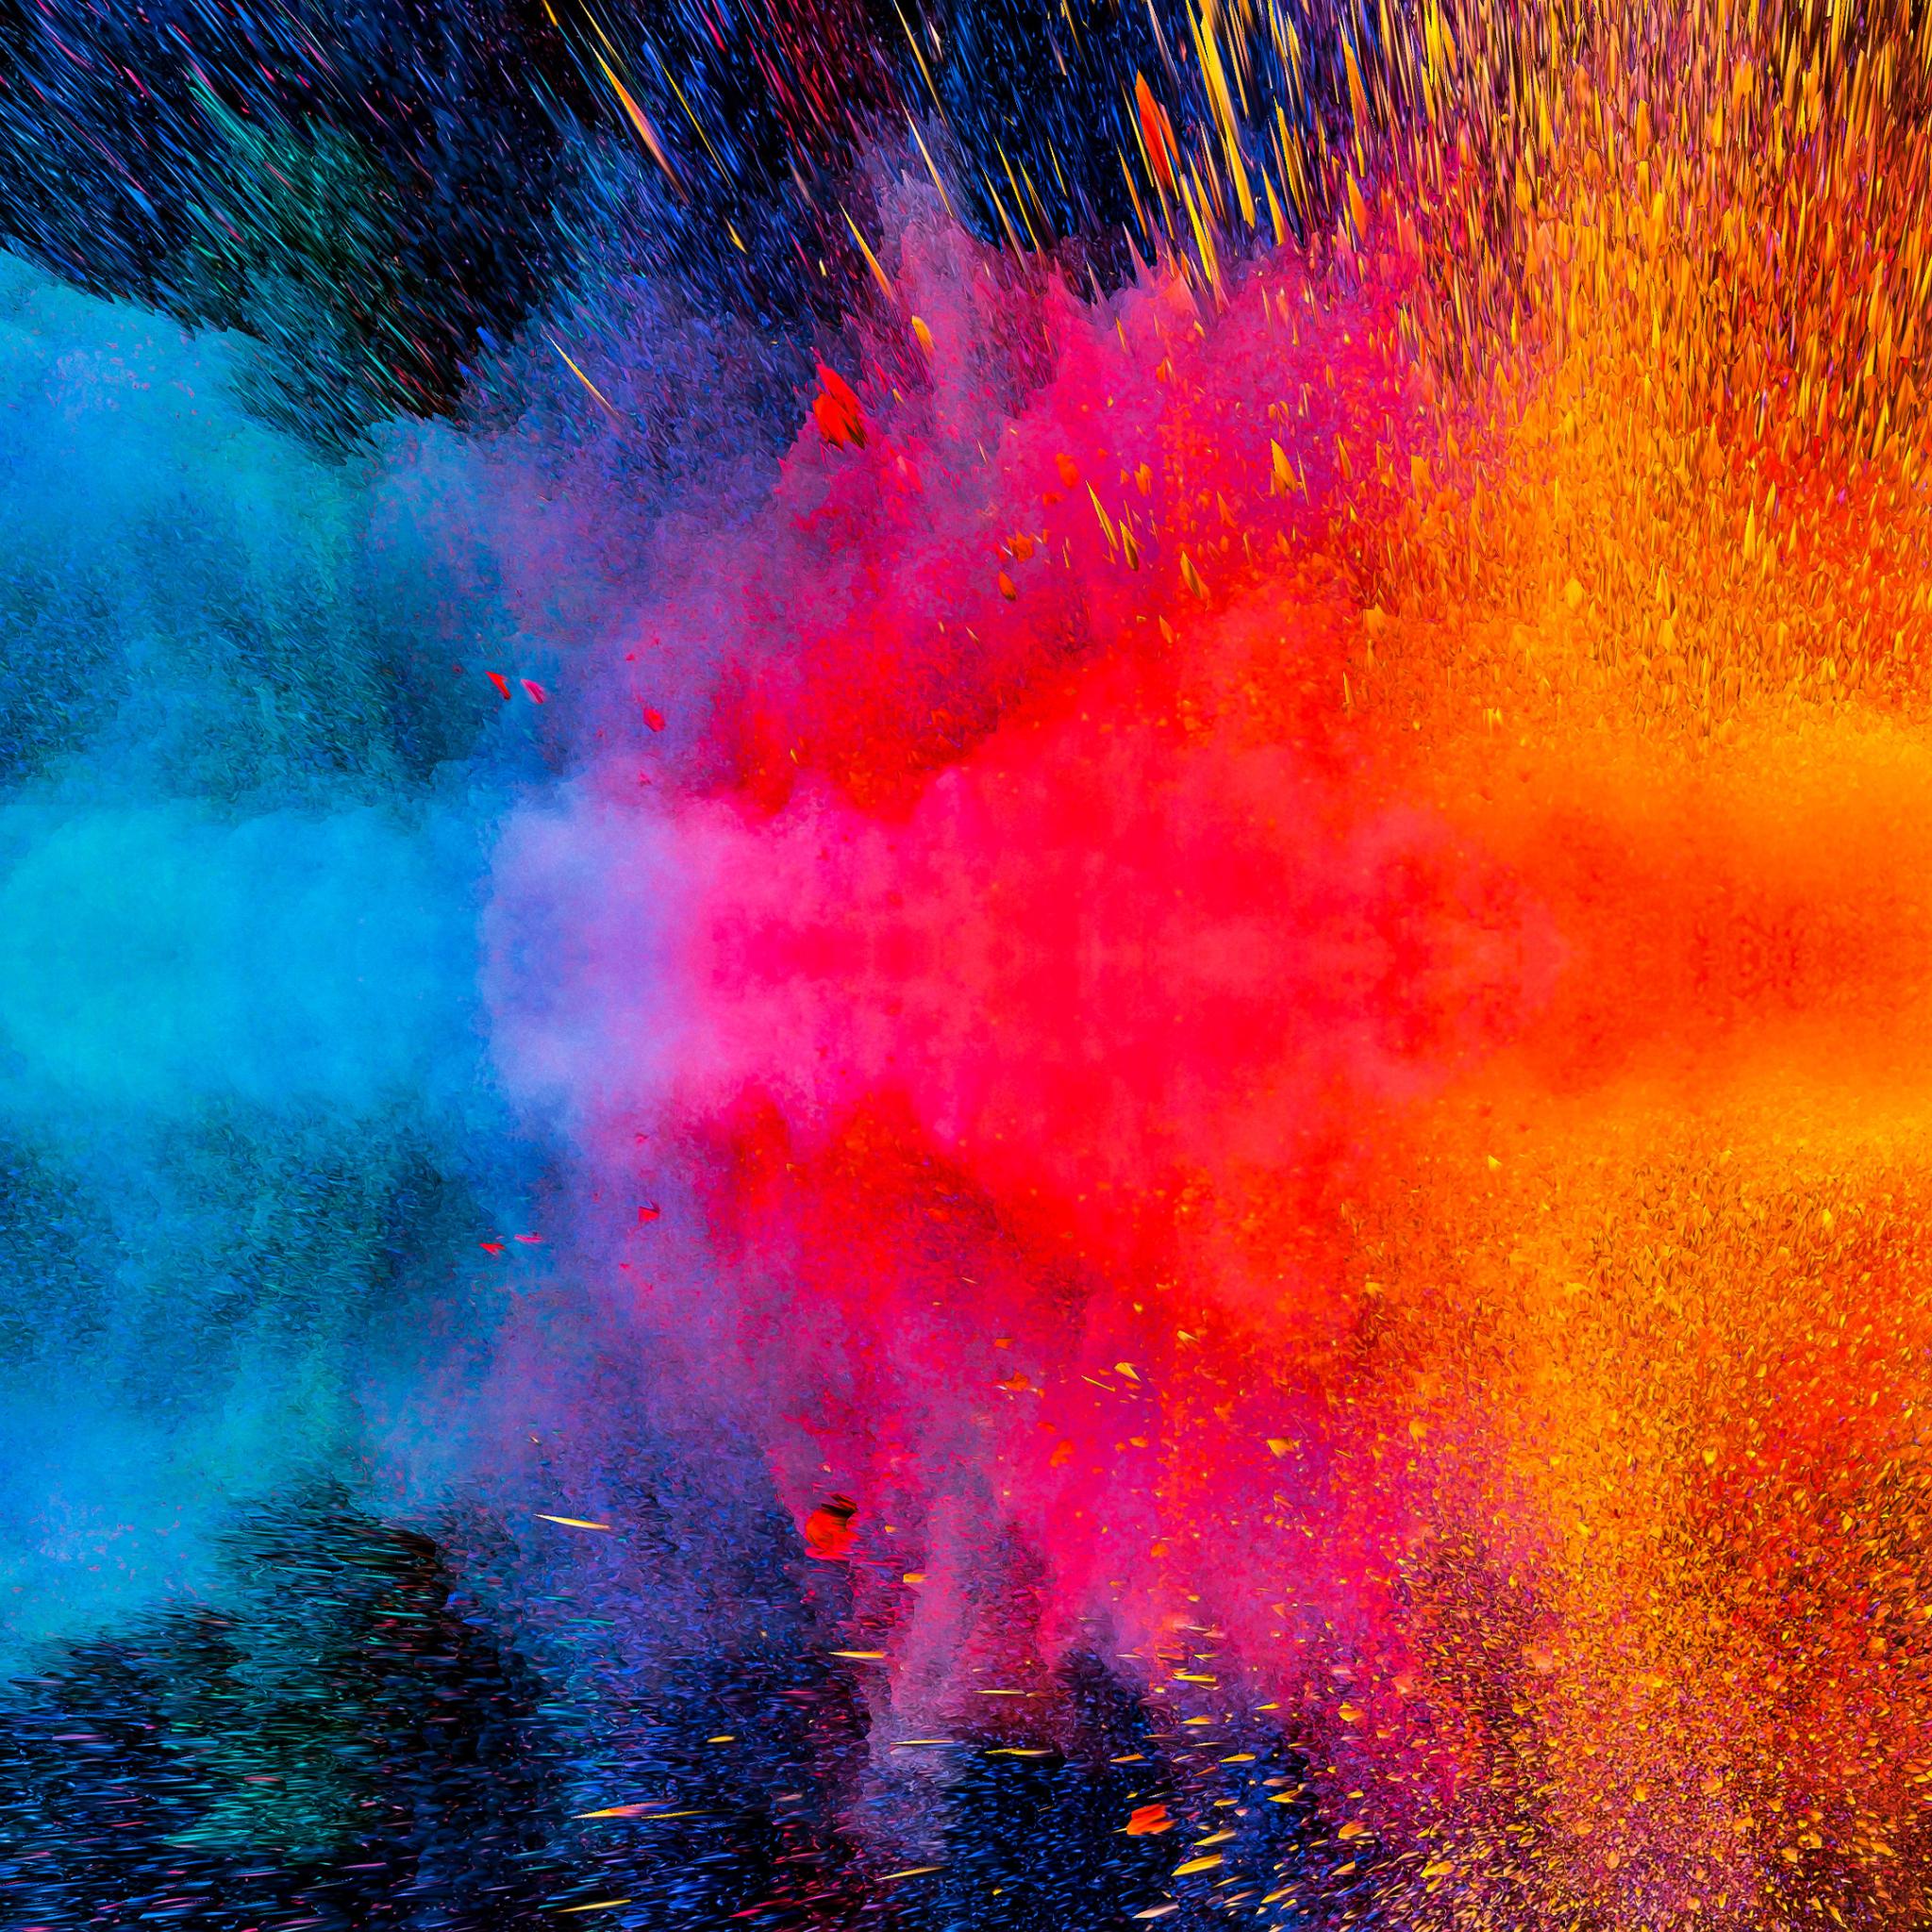 2048x2048 Colorful Dispersion 4K Ipad Air Wallpaper, HD